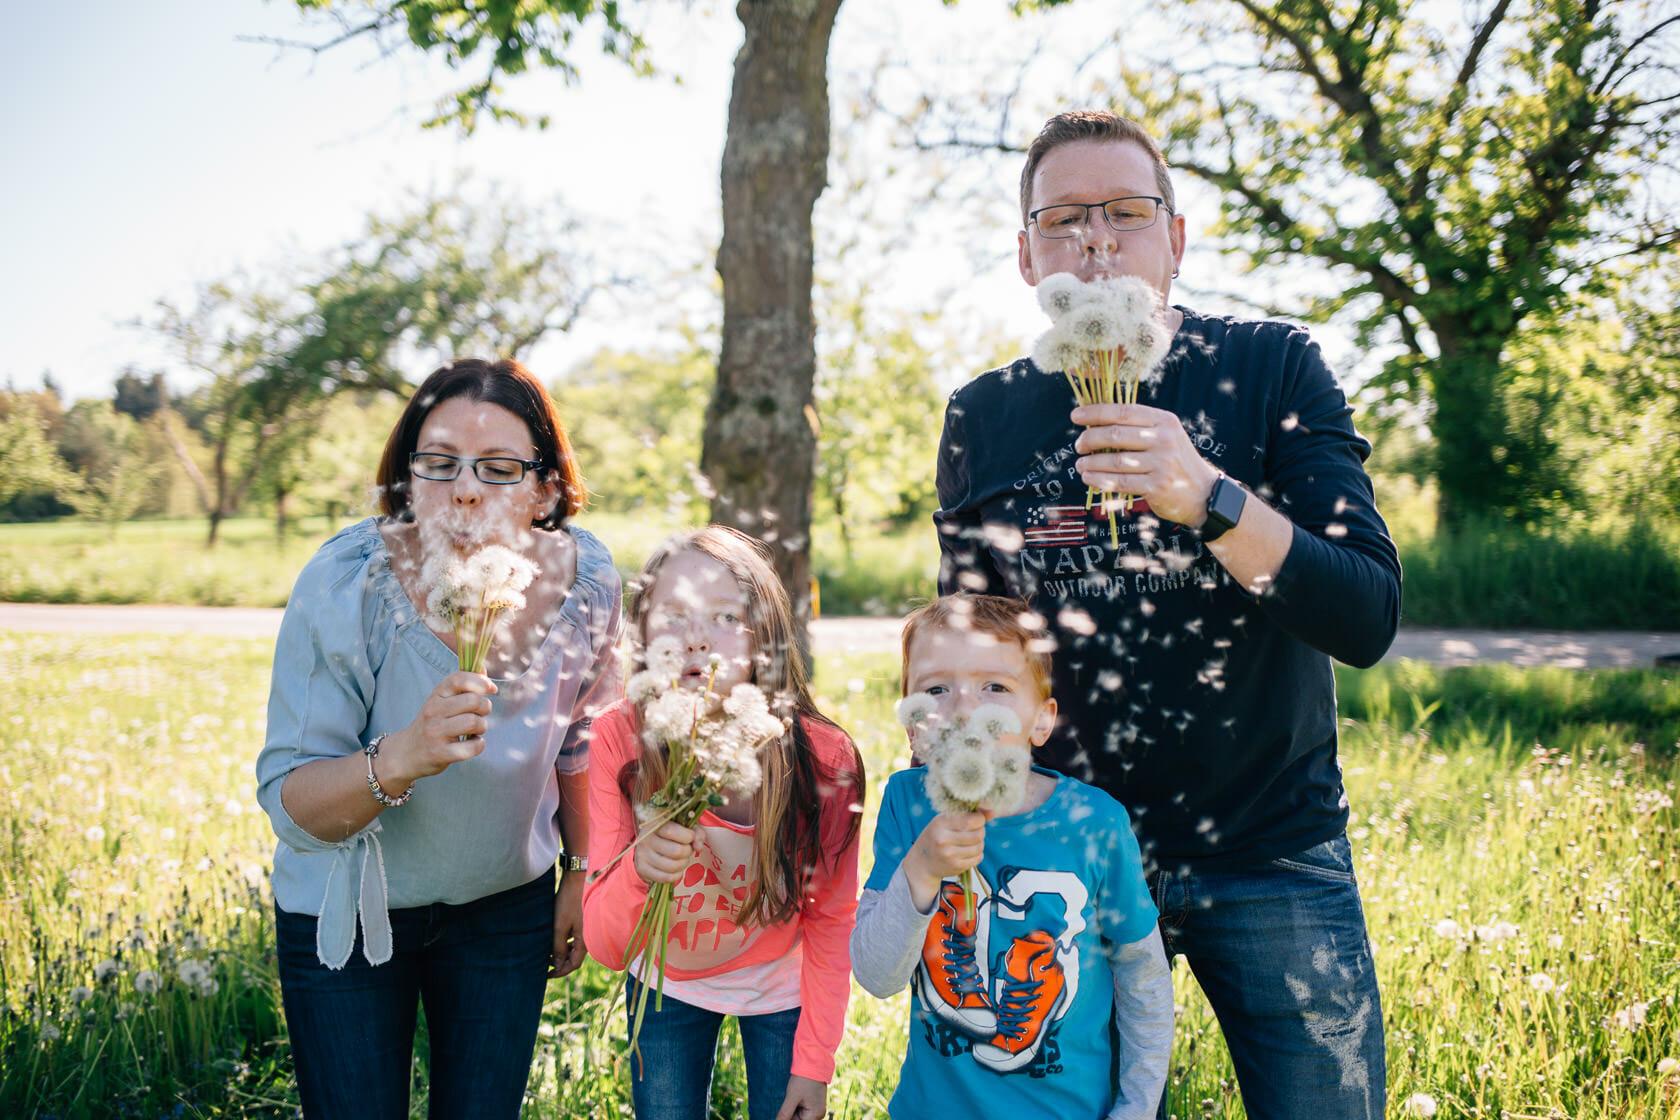 Familienfotos in der Natur Familienfotografie Karlsruhe Sommerfotos Pusteblumen Familienfotografie Fotograf